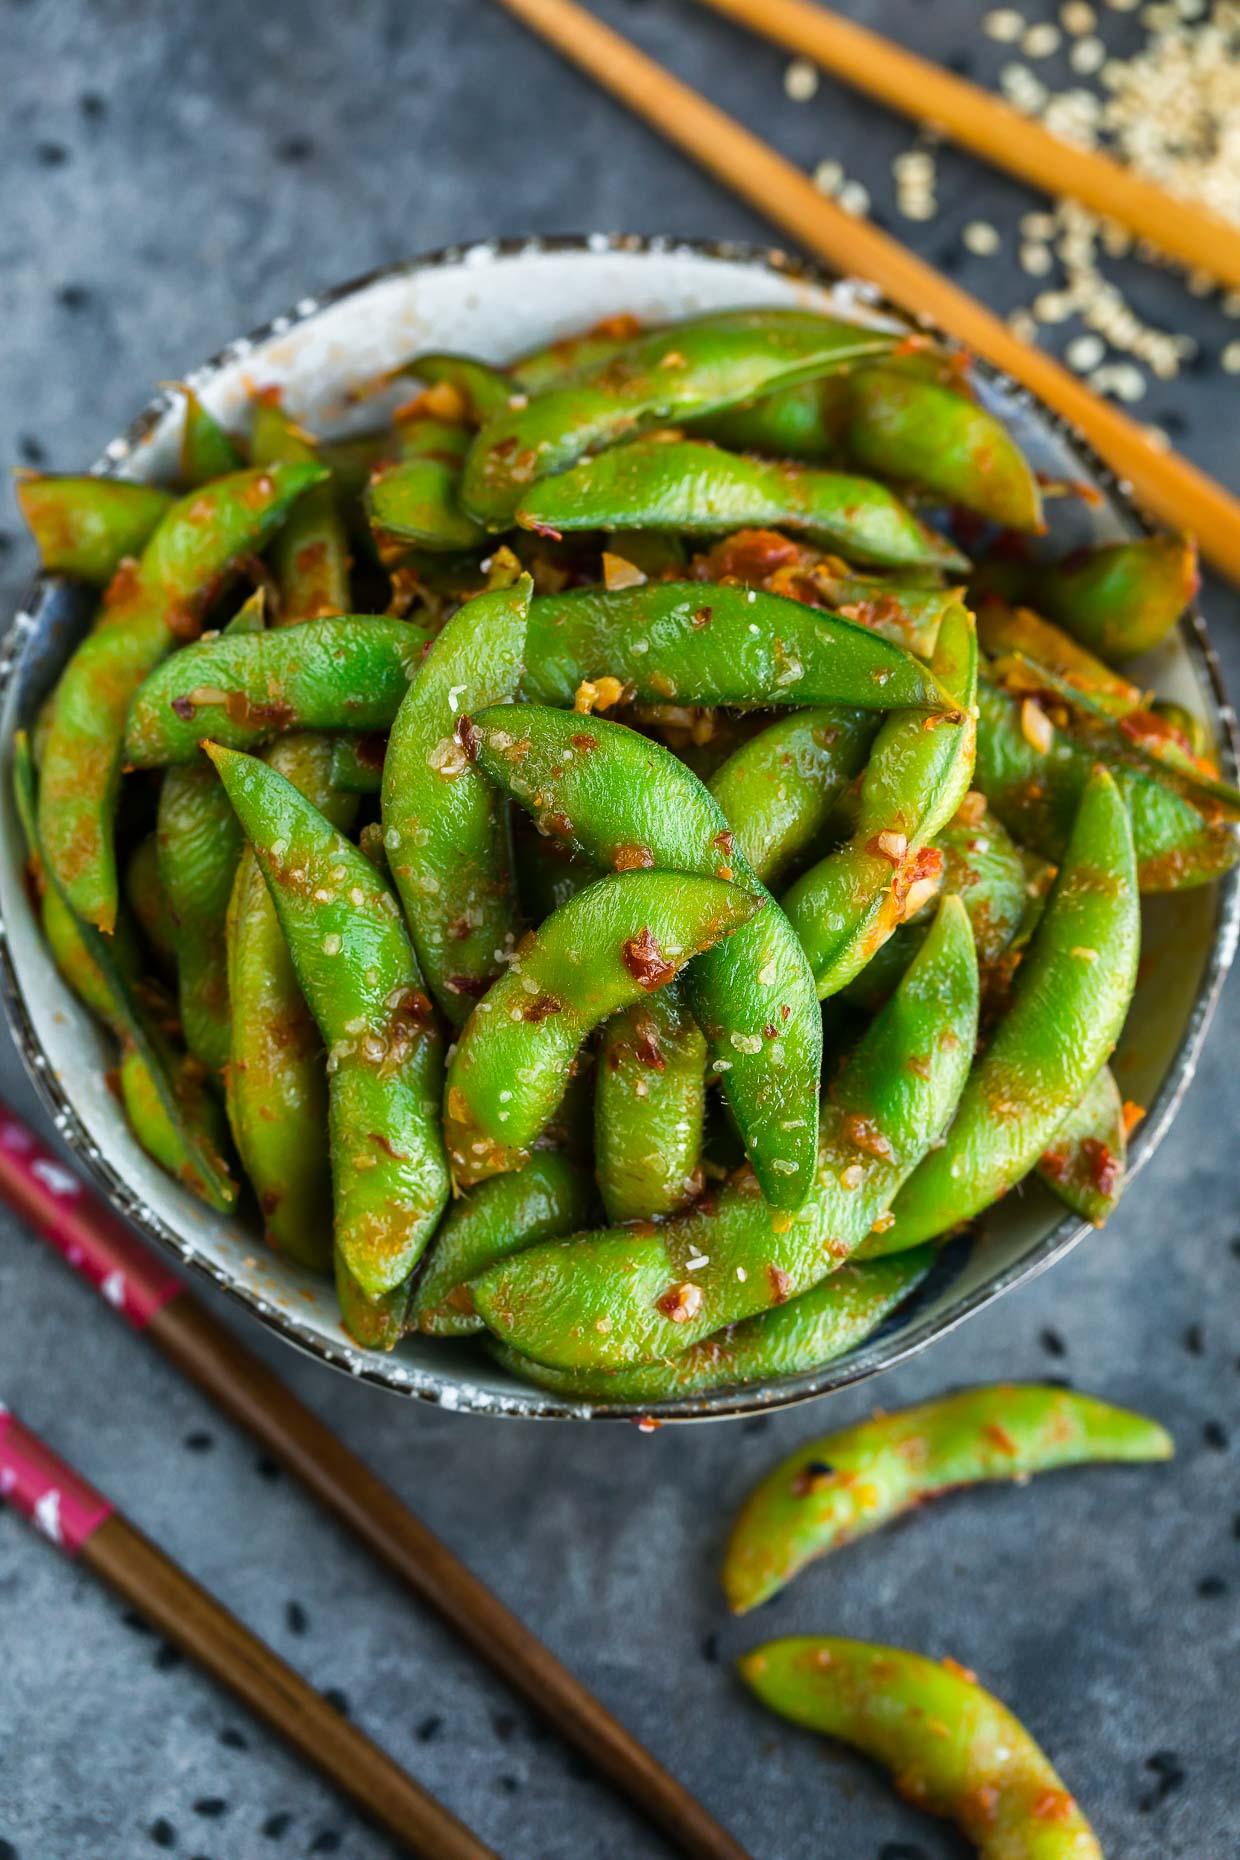 Spicy Sambal Edamame